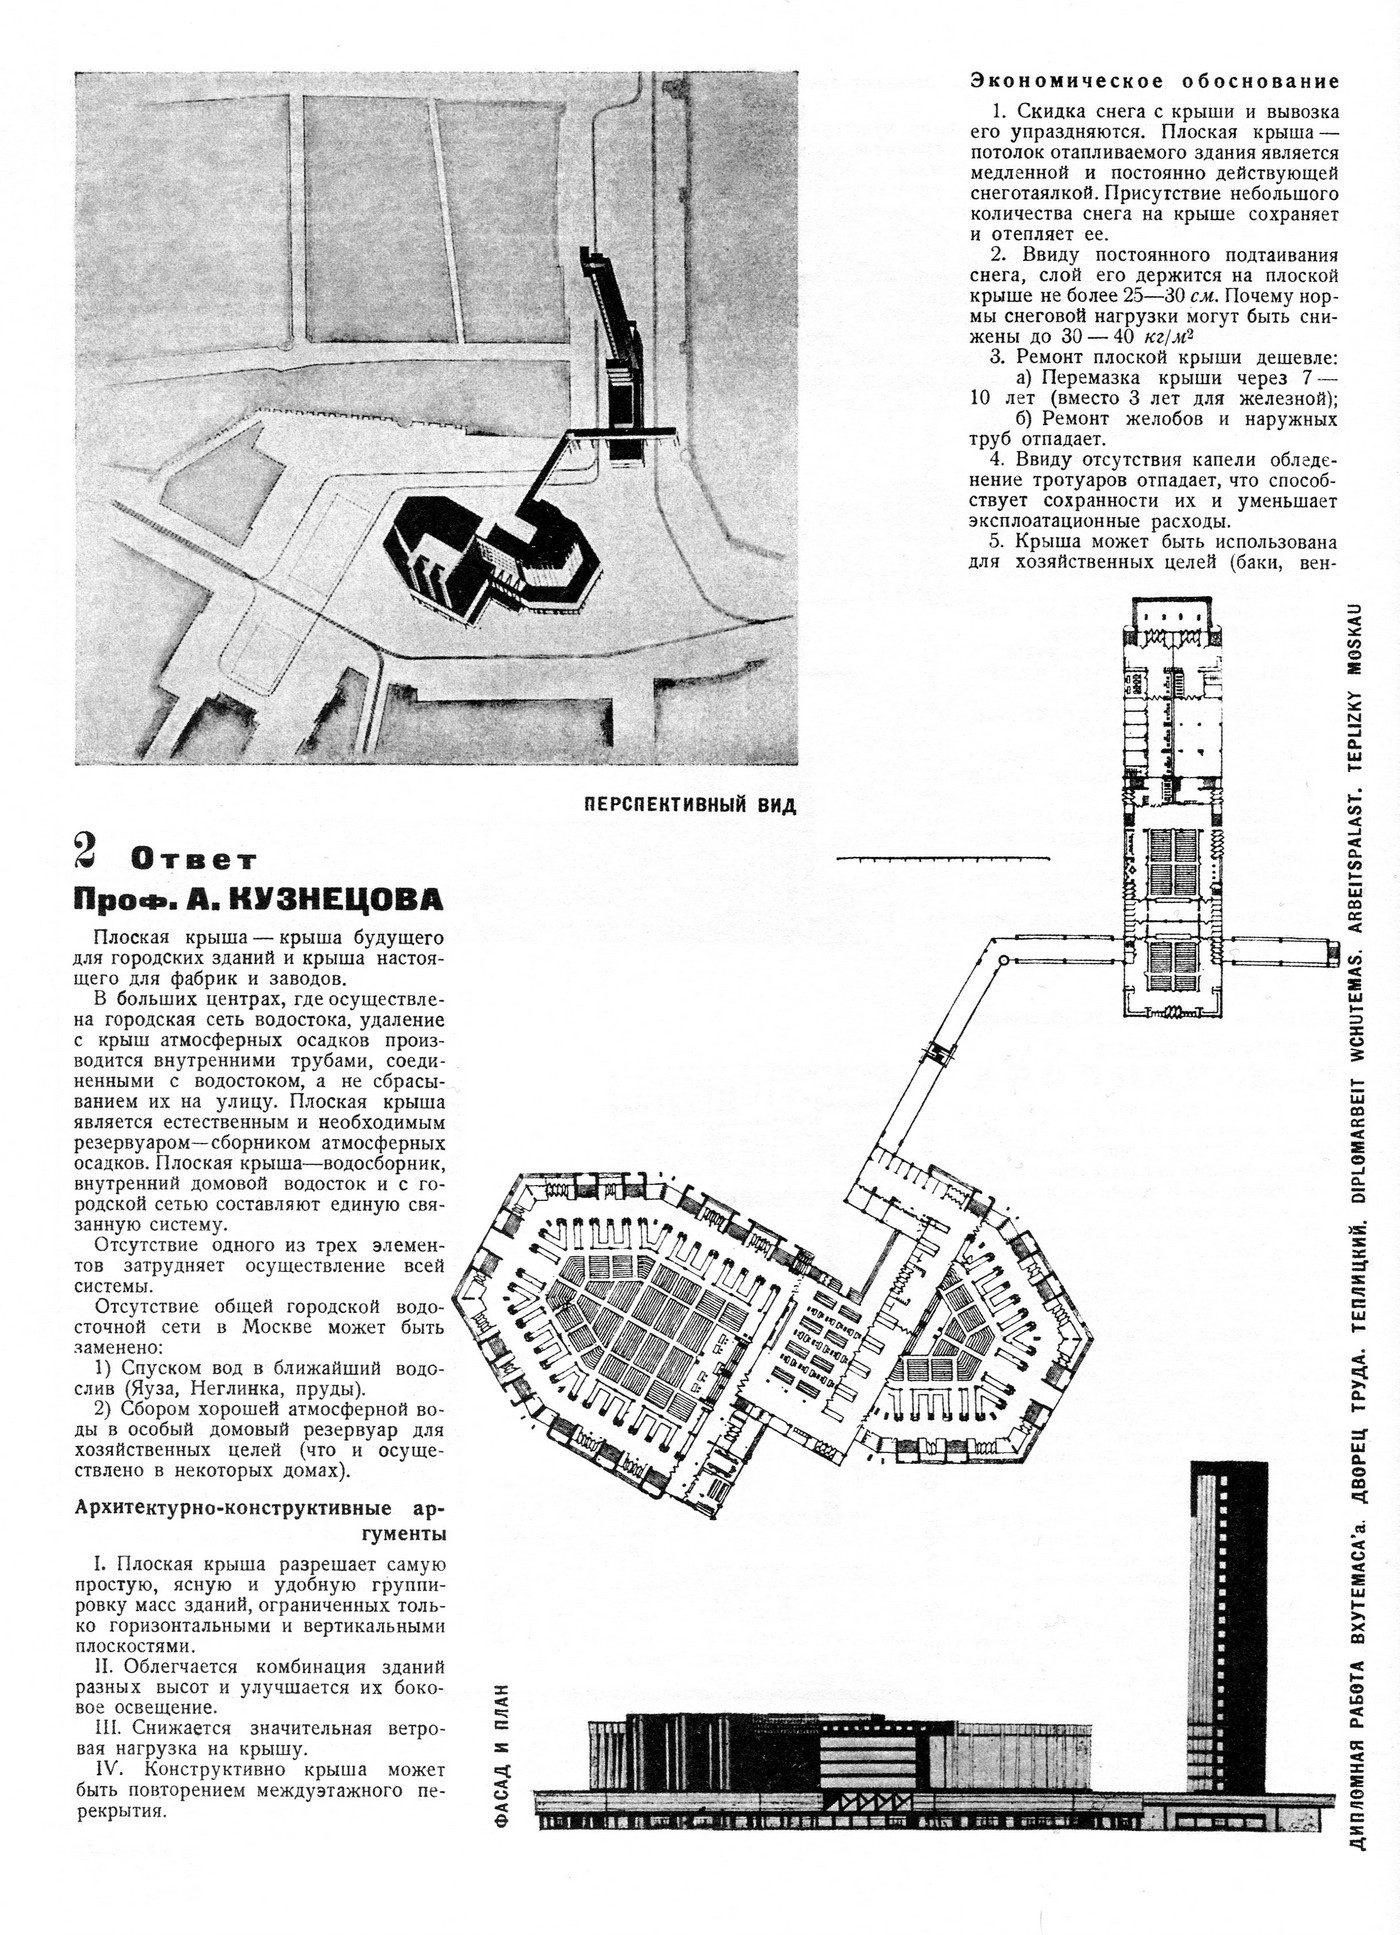 tehne.com-sa-1926-5-6-1400-0020